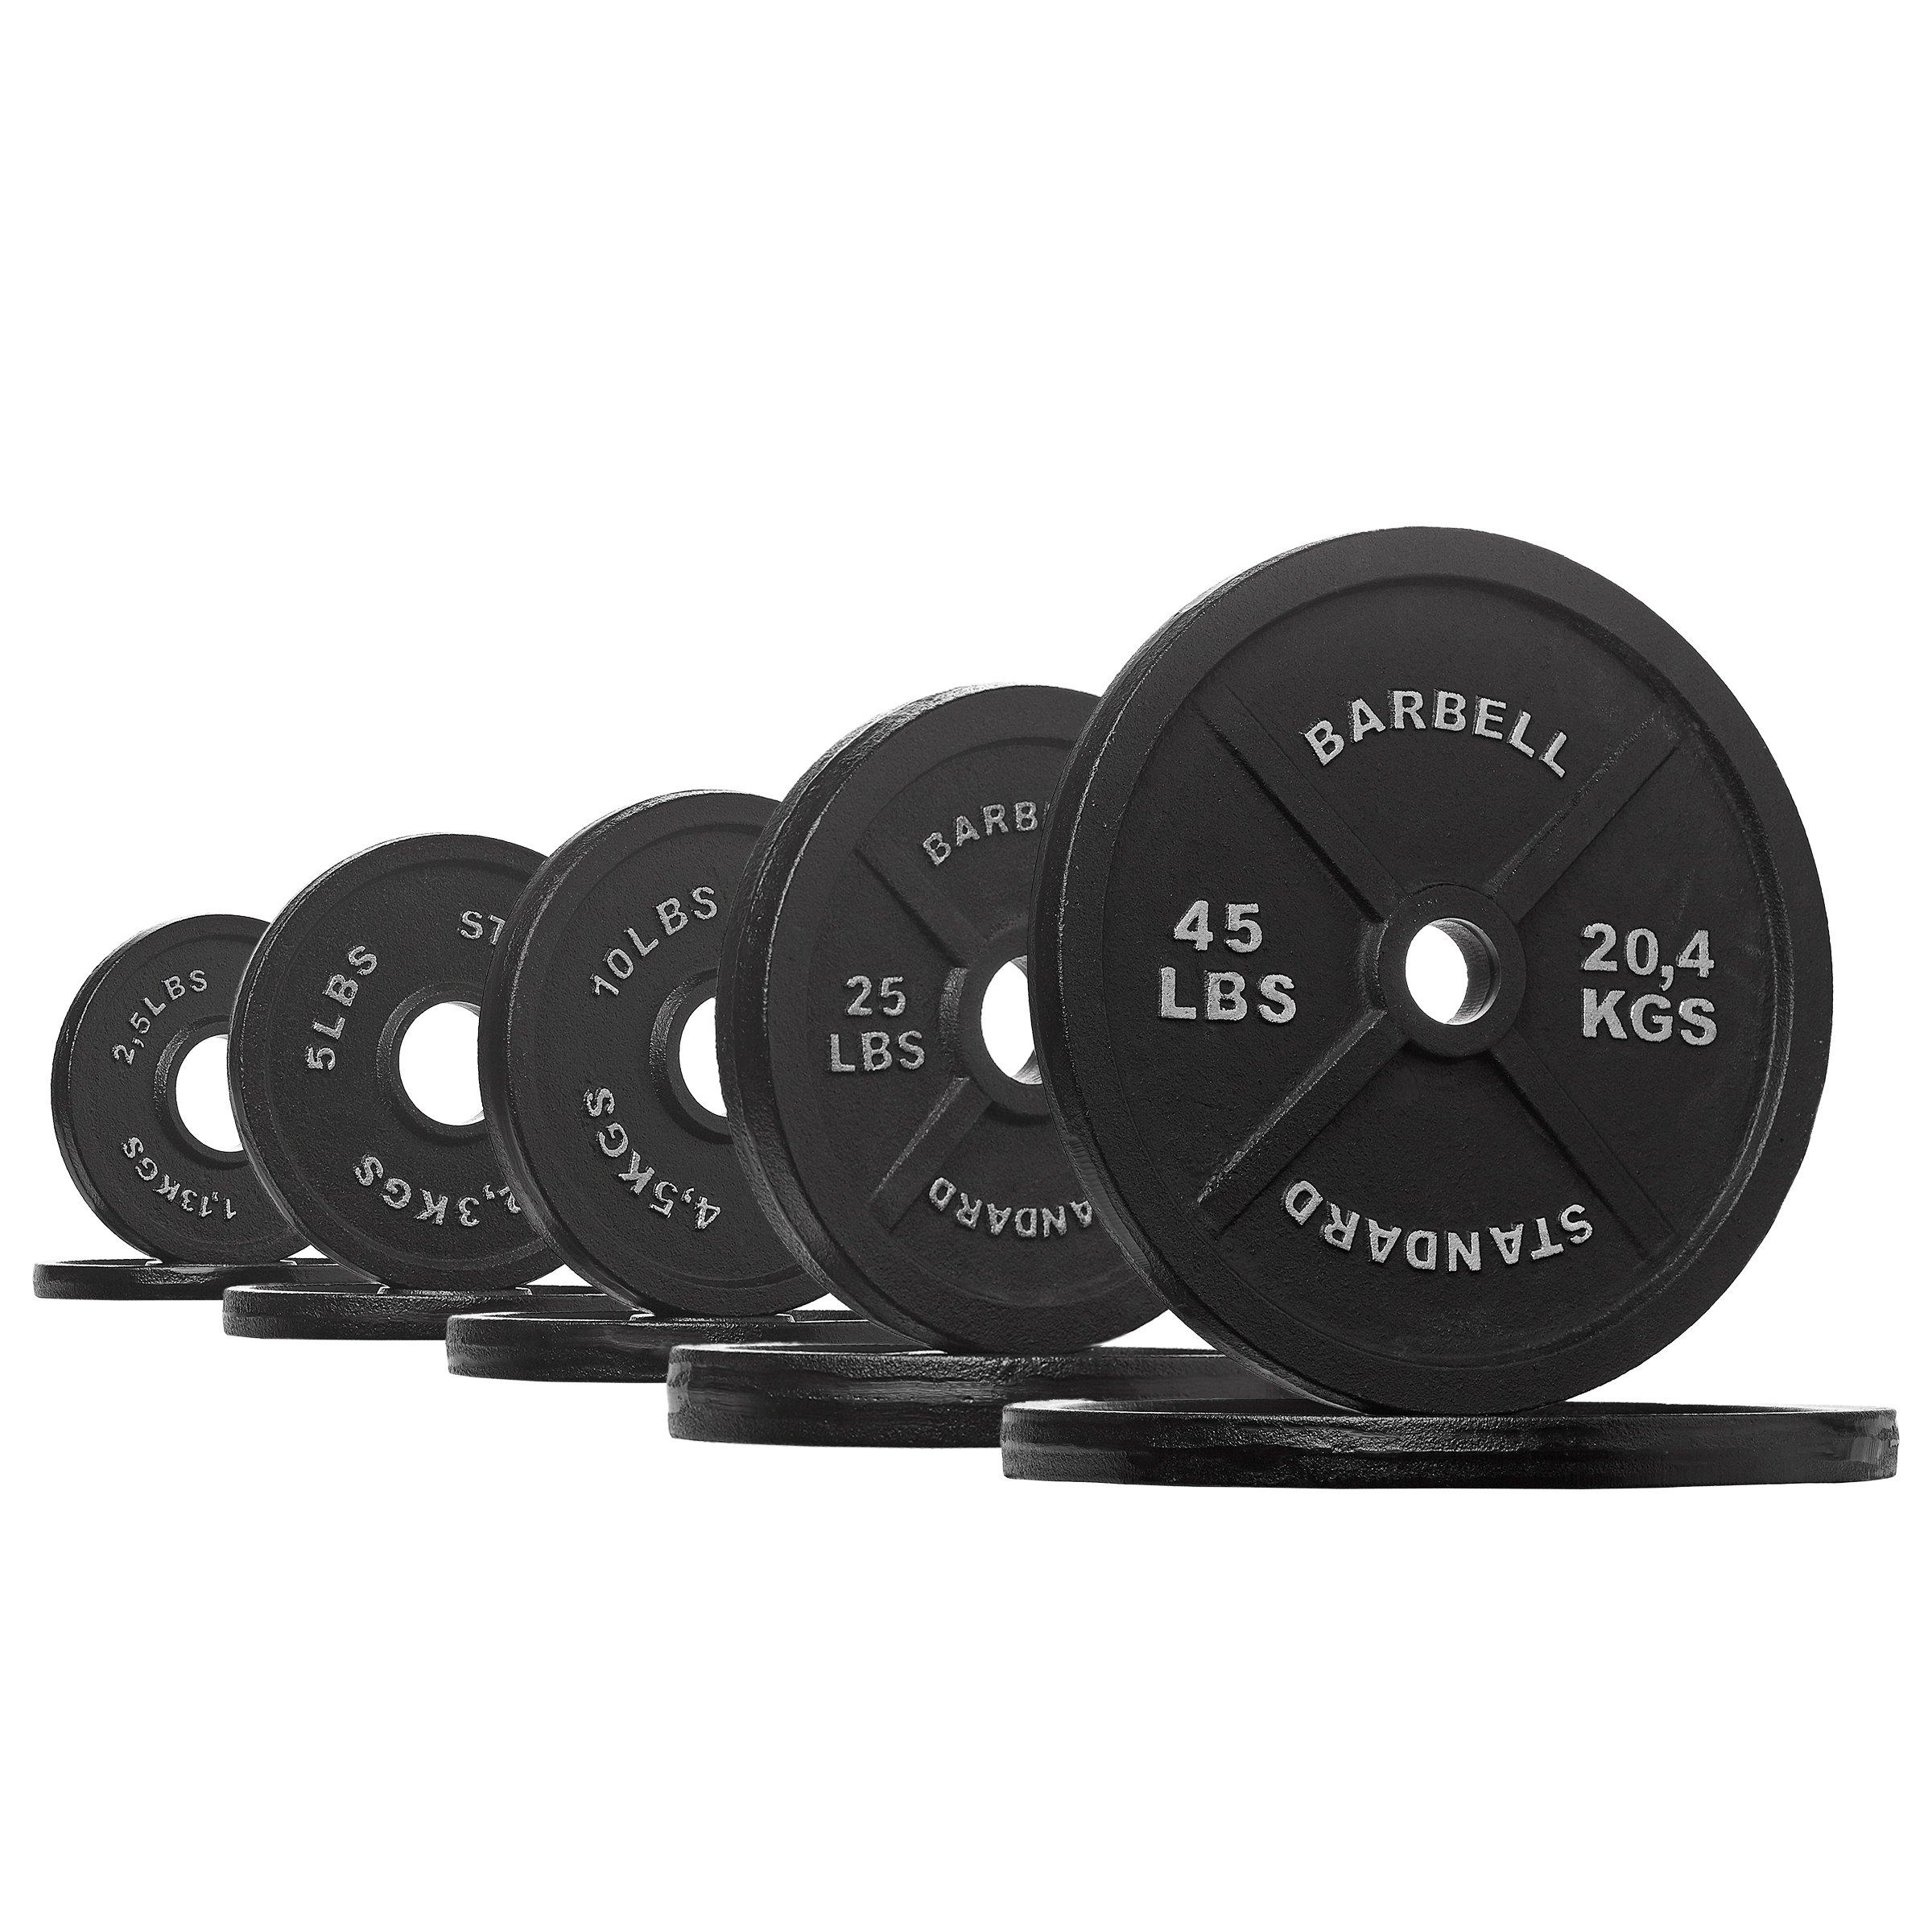 Rep Iron Plates, 175 lb Set